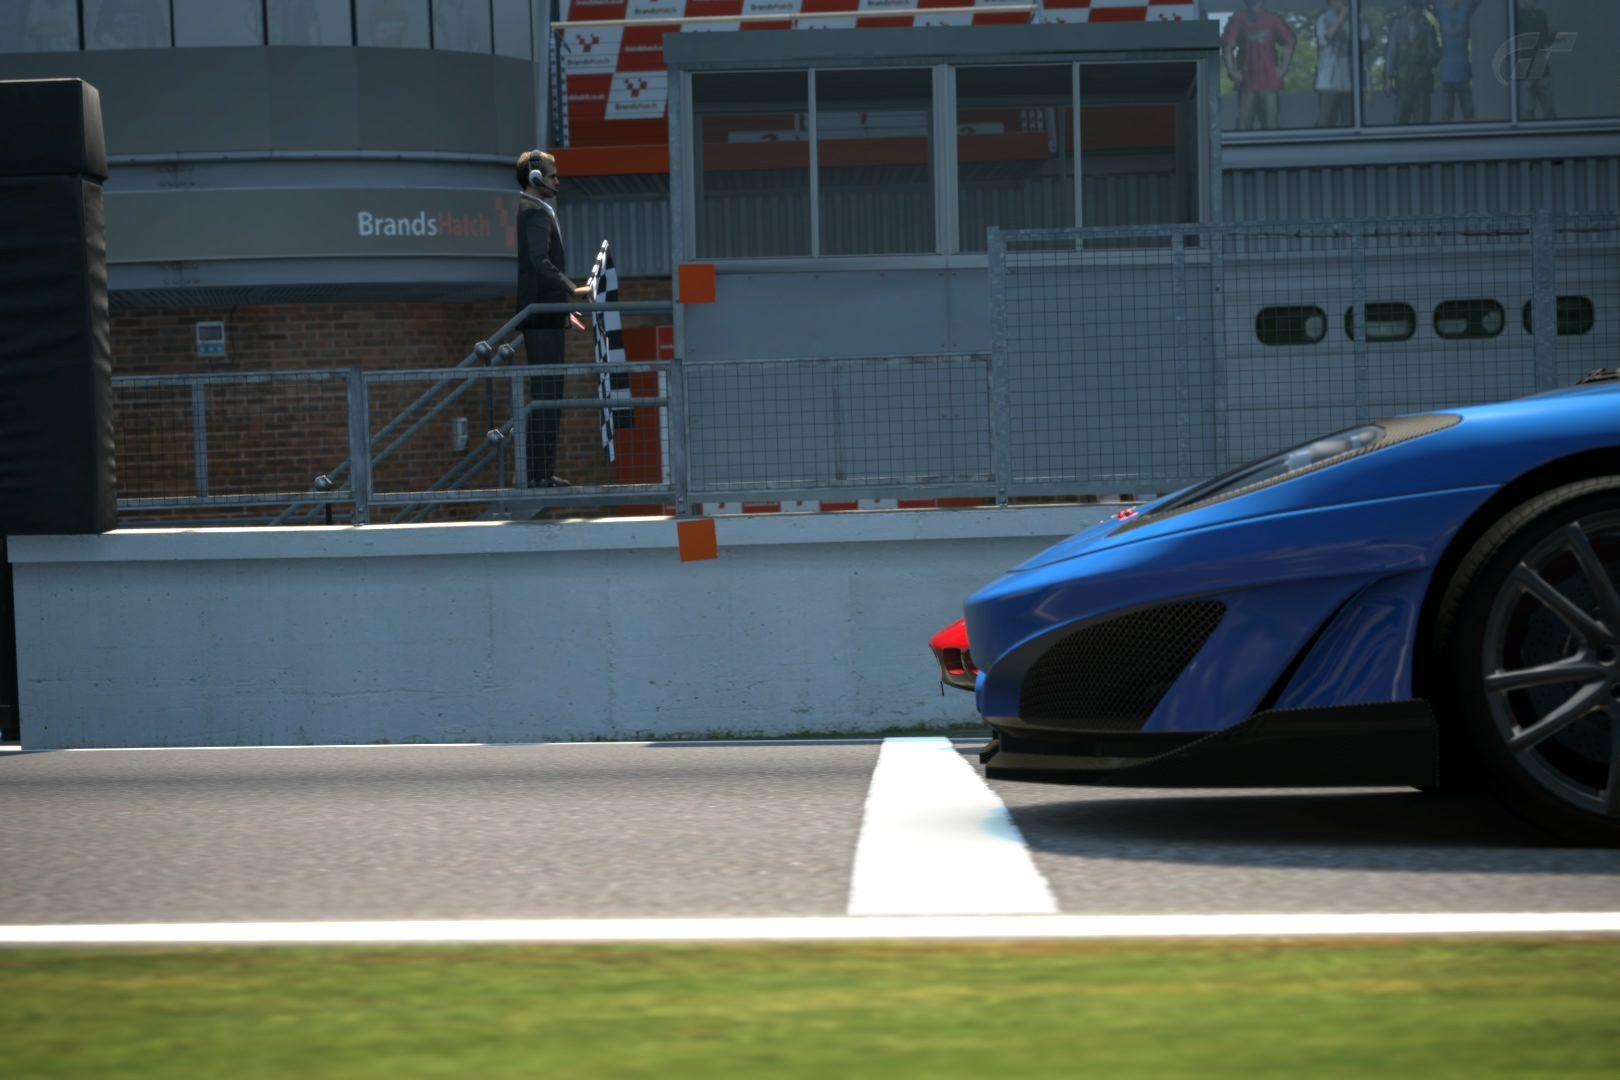 Brands Hatch Grand Prix Circuit_13.jpg